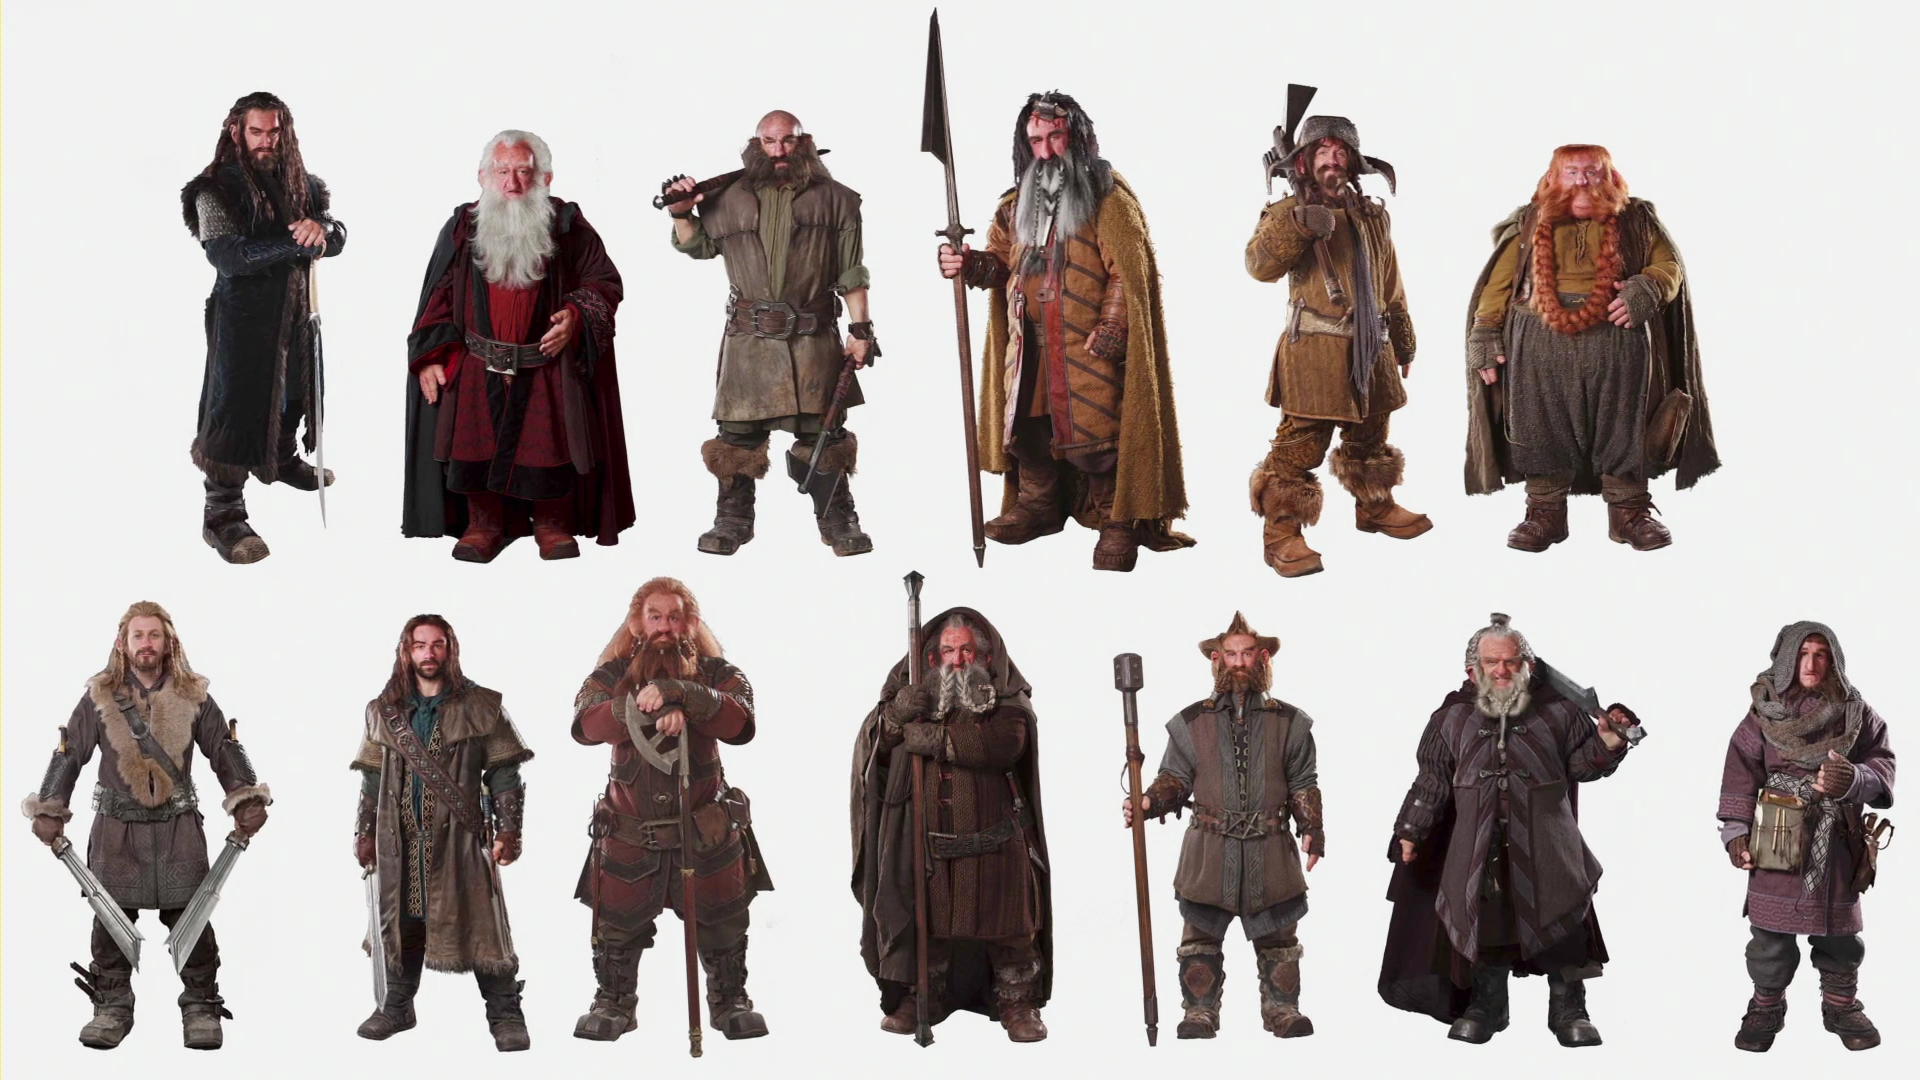 Drawn dwarf the hobbit character Melinor  clothing clothing Google